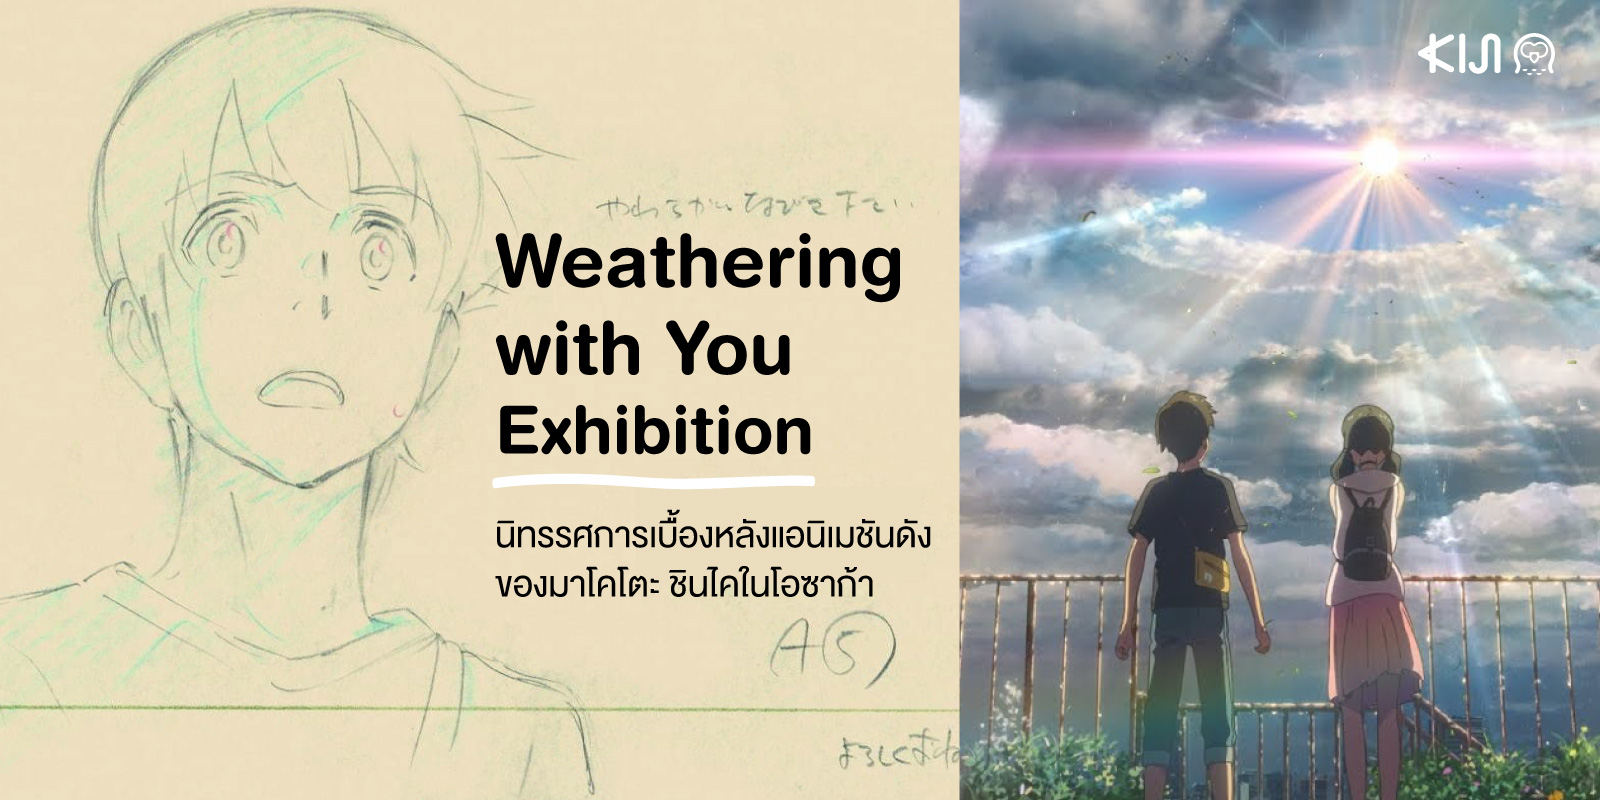 Weathering with You Exhibition จังหวัดโอซาก้า